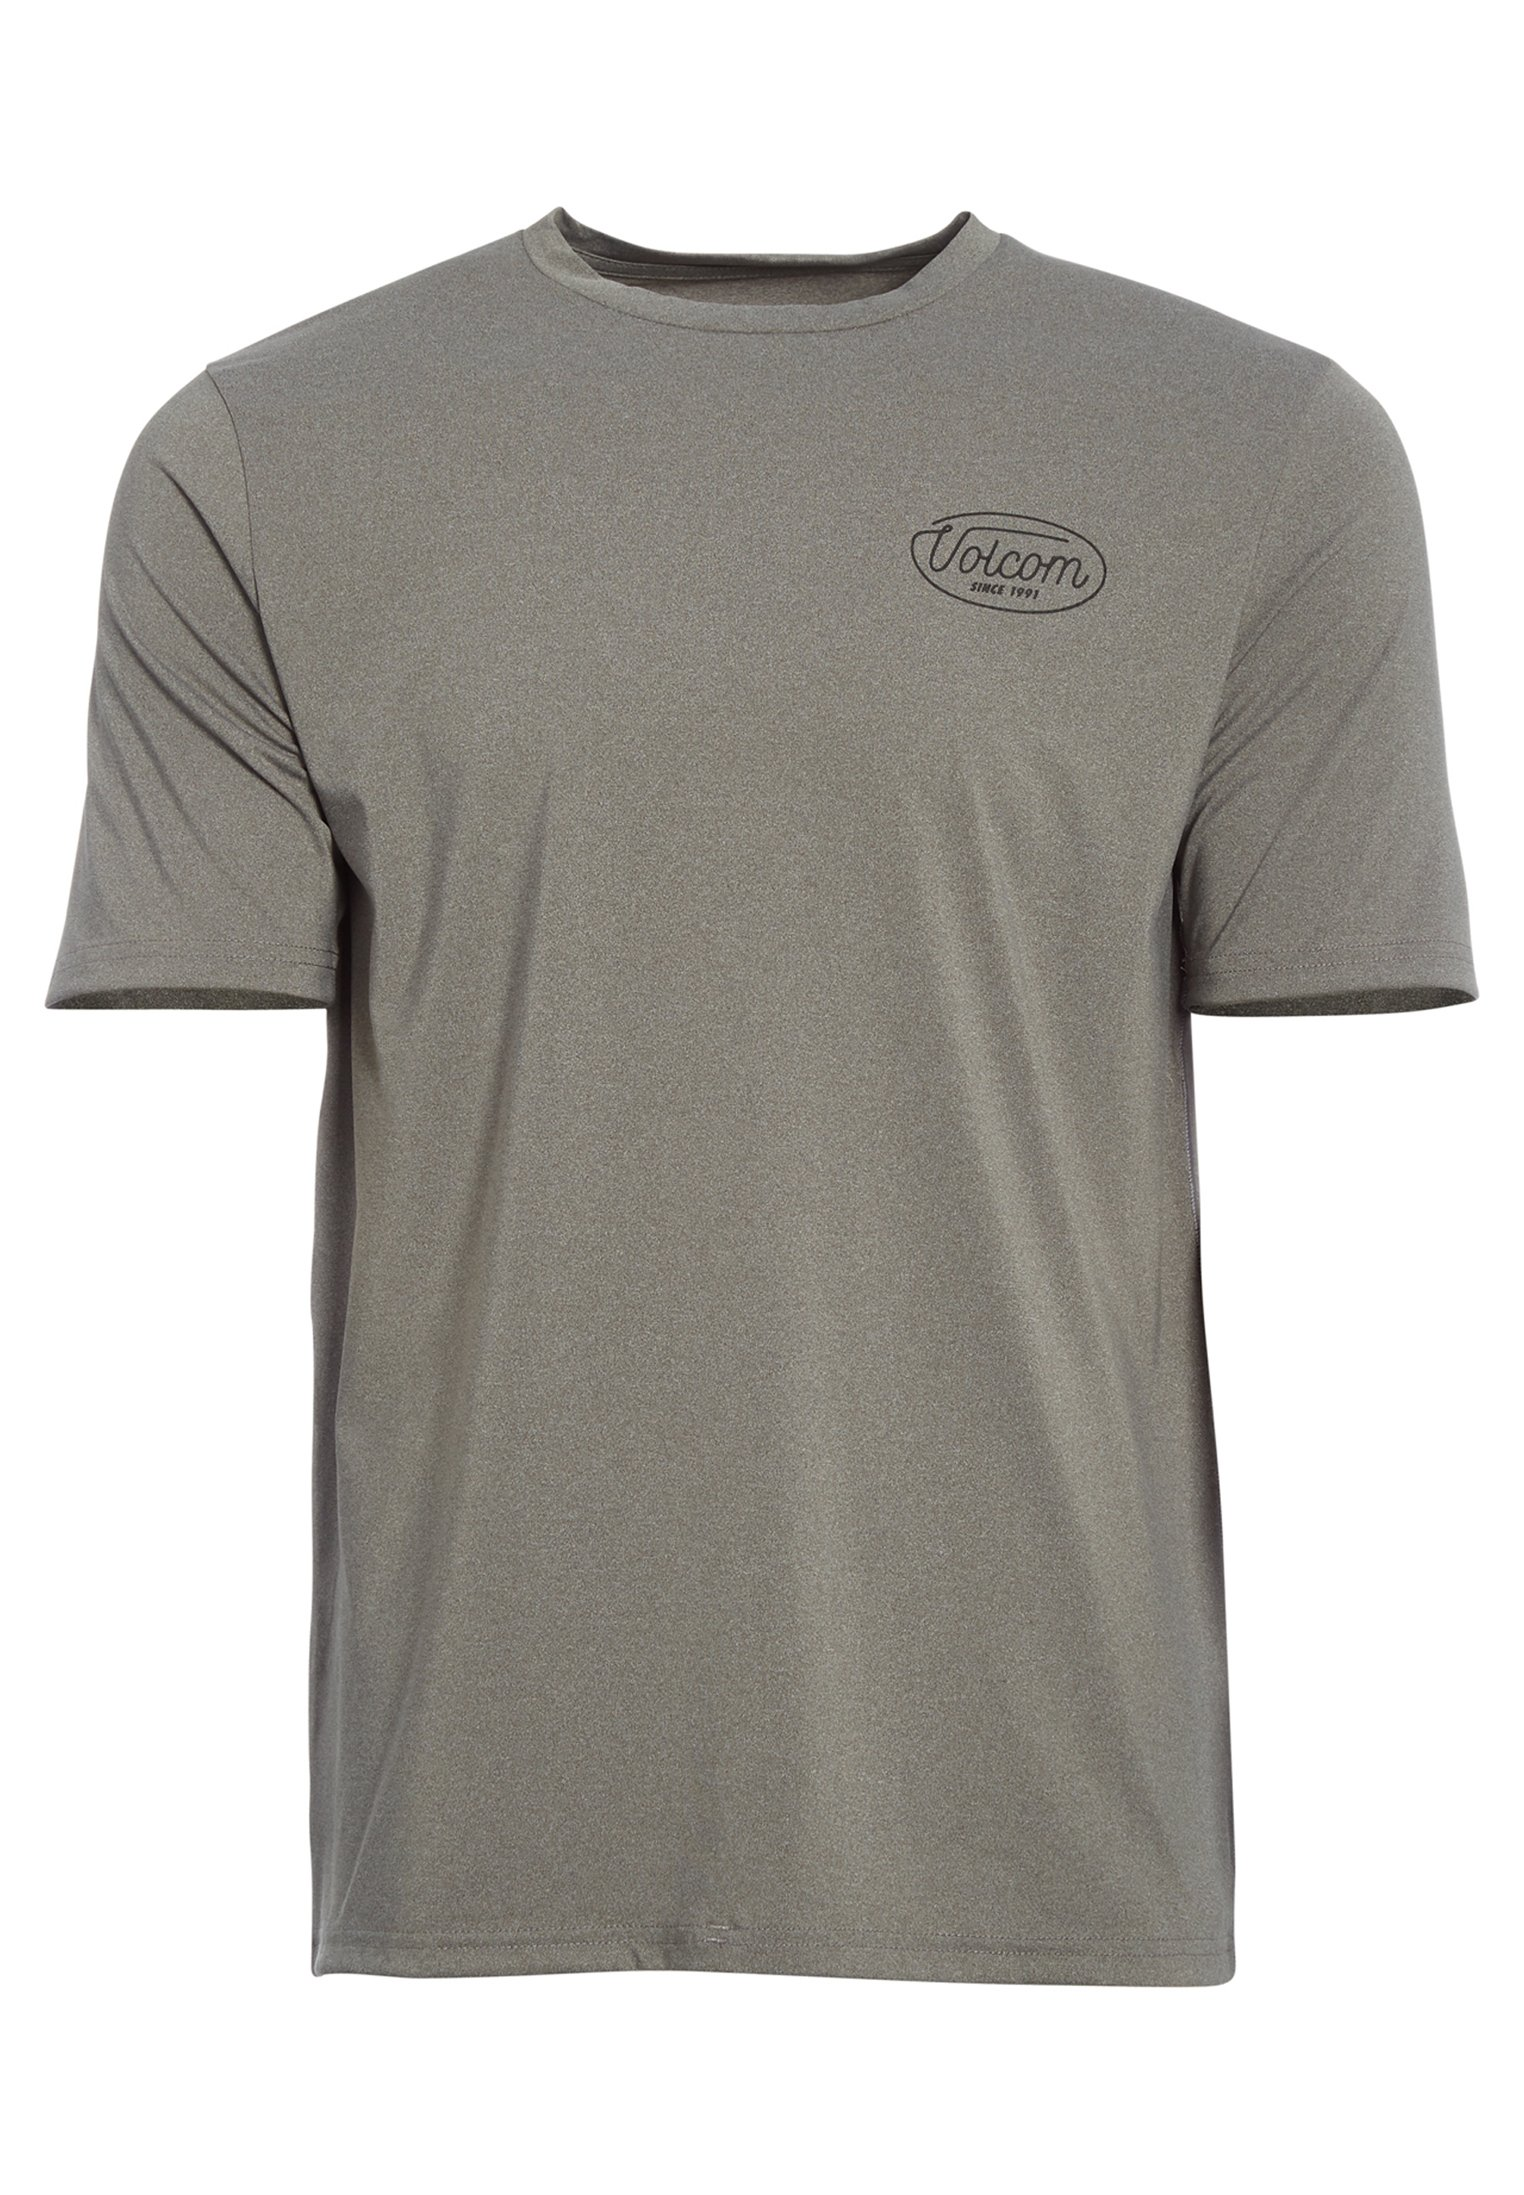 Volcom Lit S/s - T-shirt Imprimé Grey